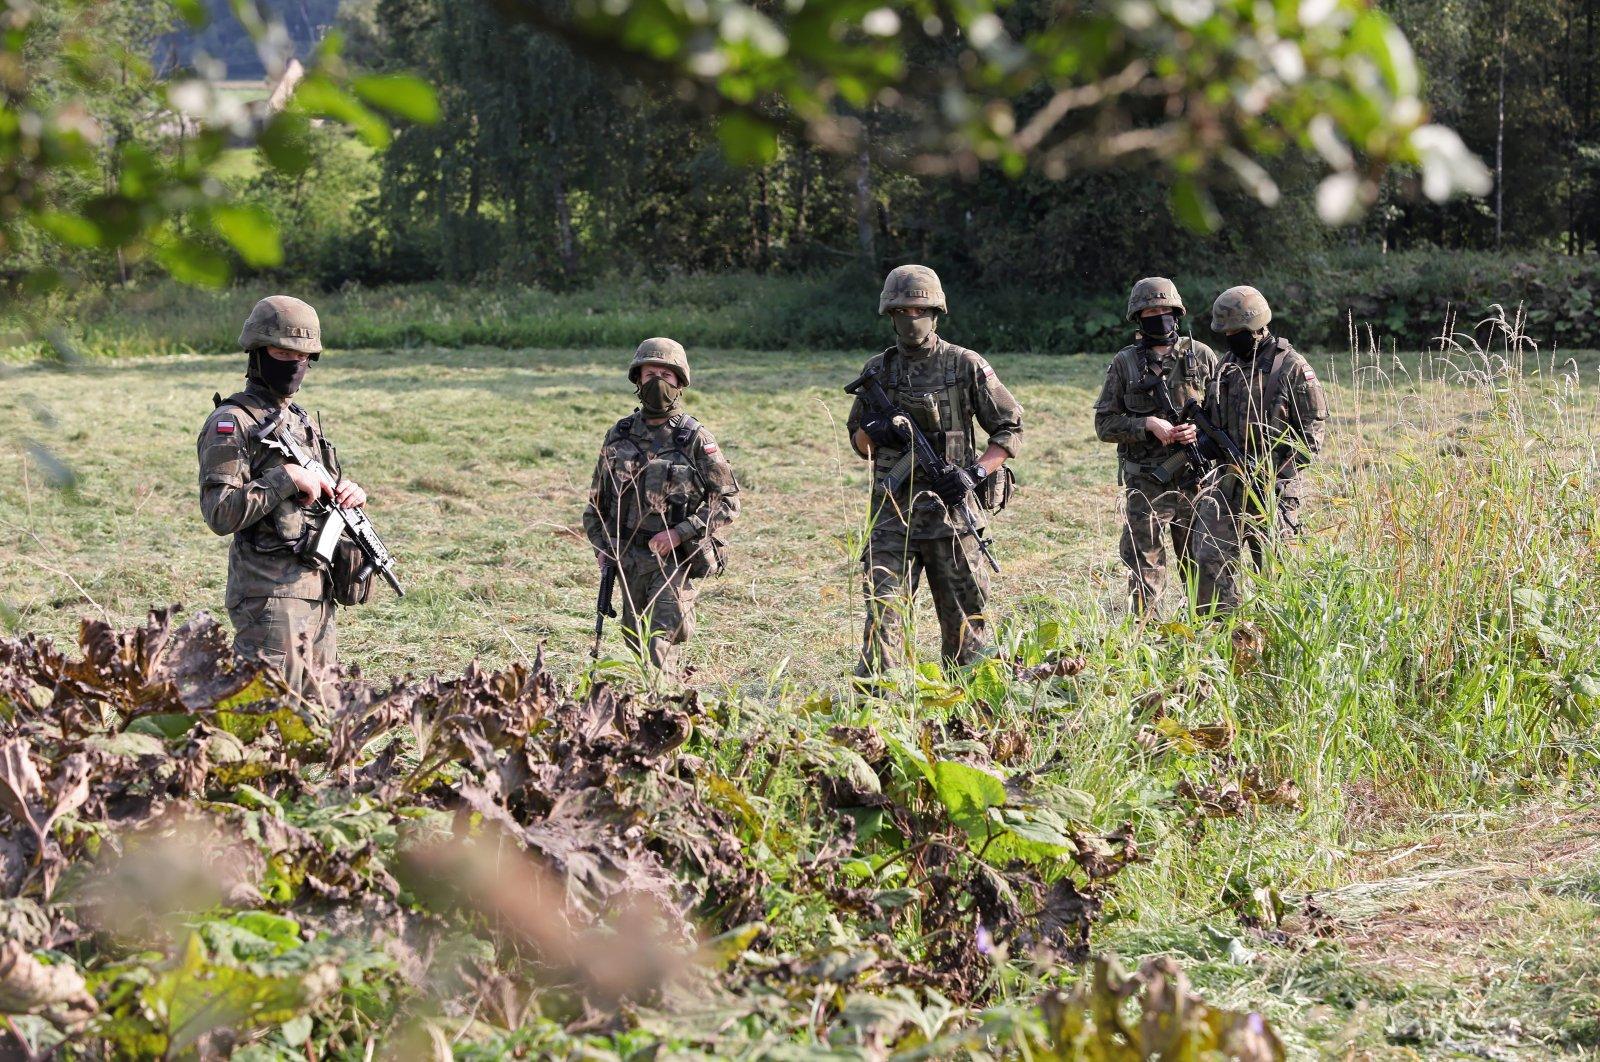 Polish border guard and the army near the town of Usnarz Górny, Poland, Aug. 22, 2021. (EPA Photo)